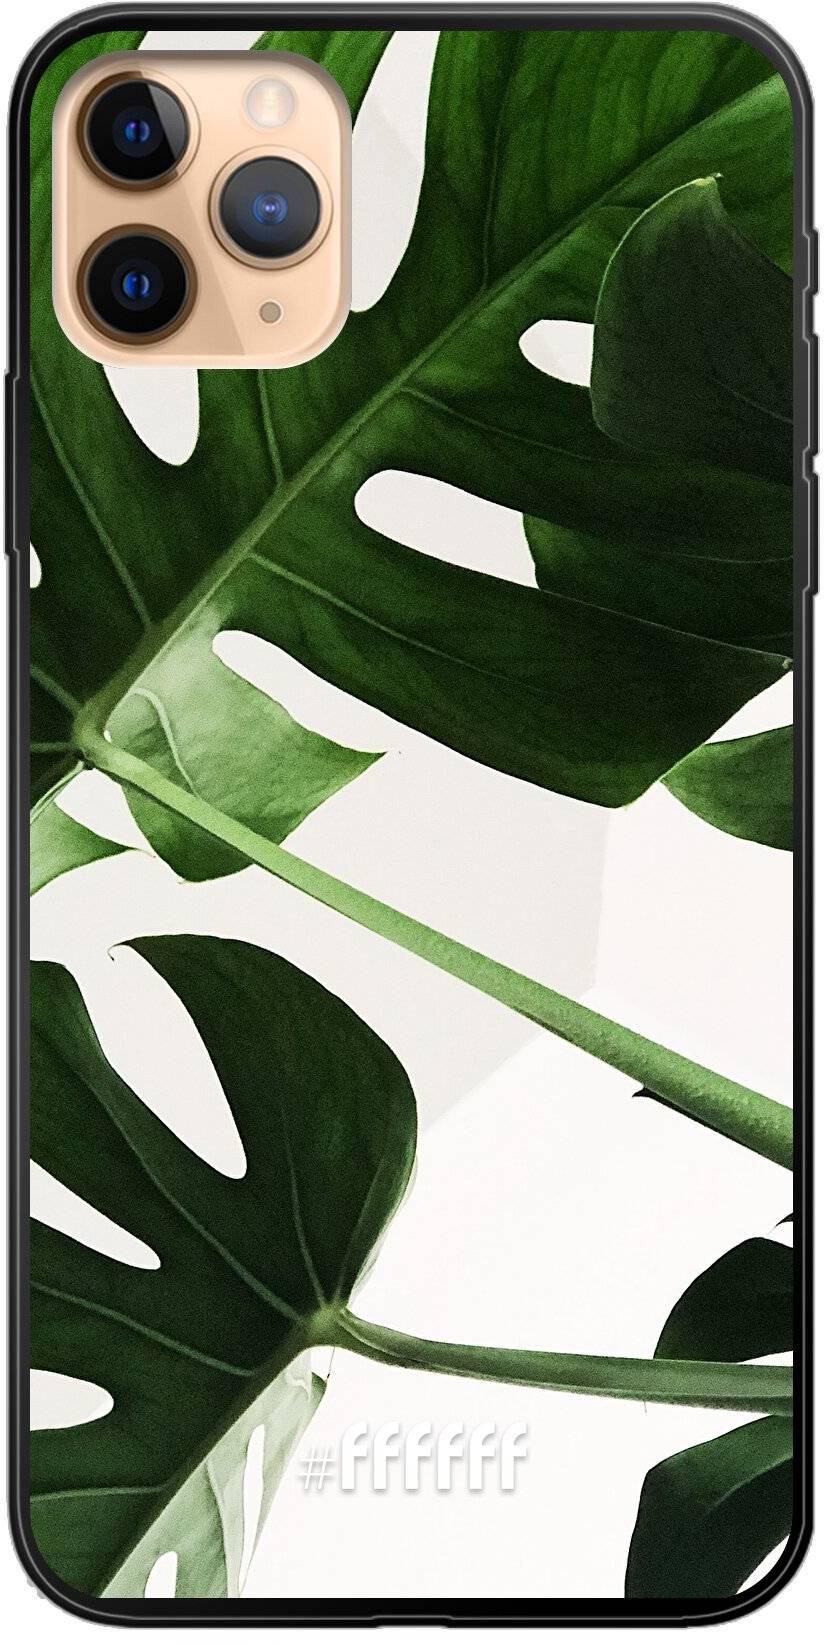 Tropical Plants iPhone 11 Pro Max